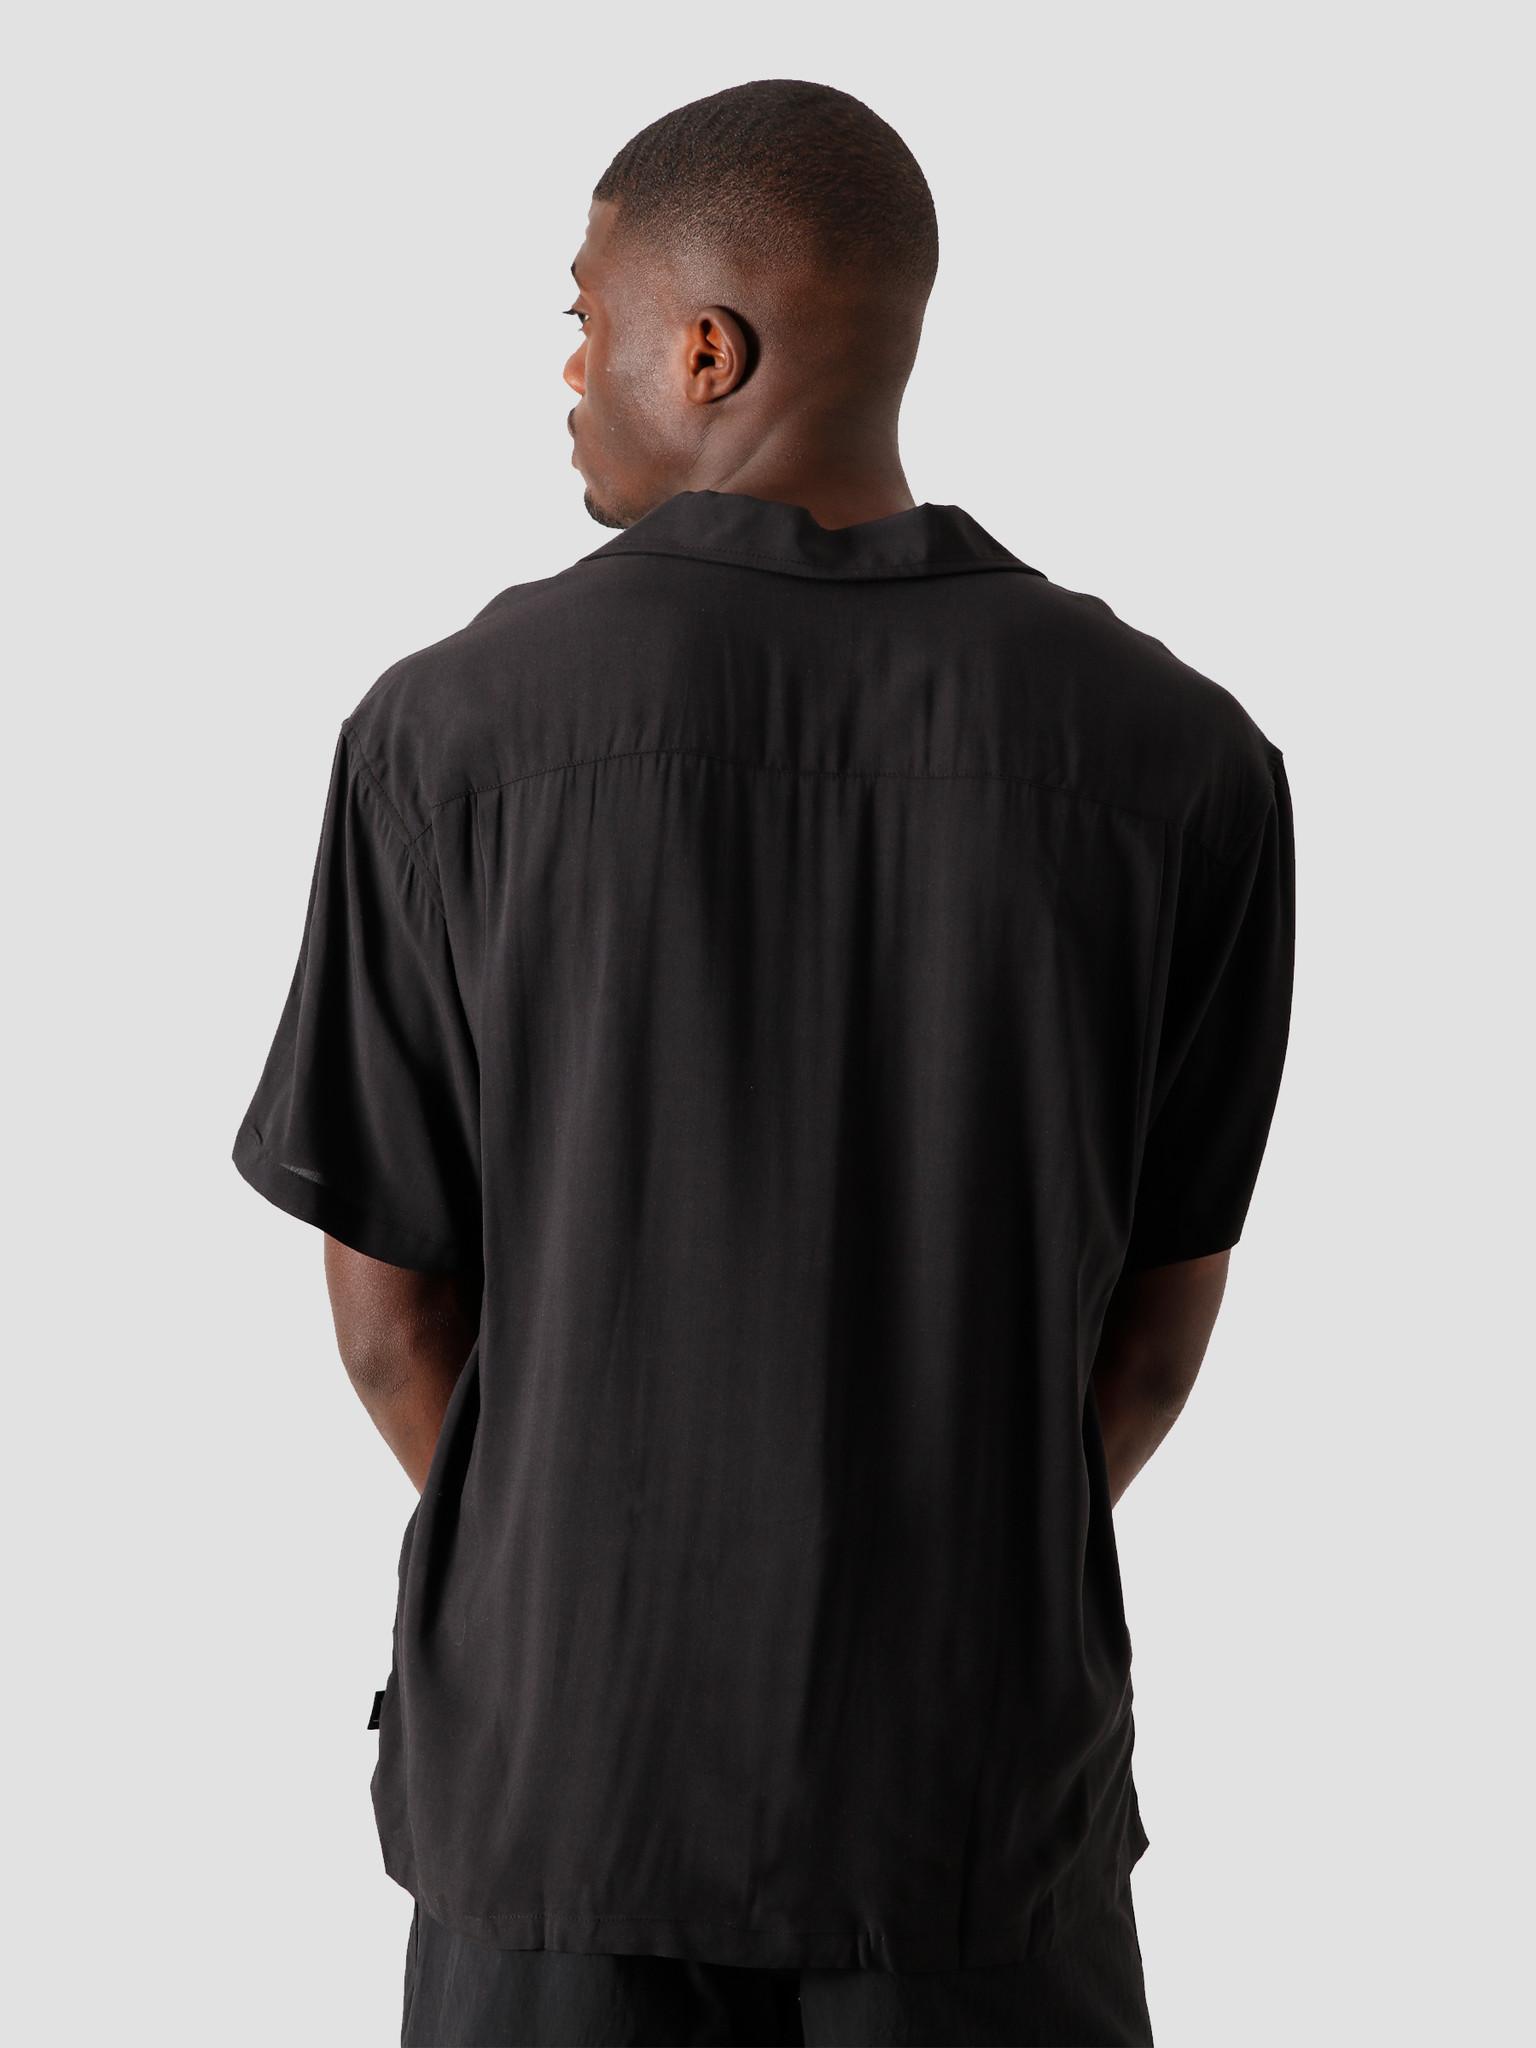 Stussy Stussy Pool Hall Shirt Black 1110119